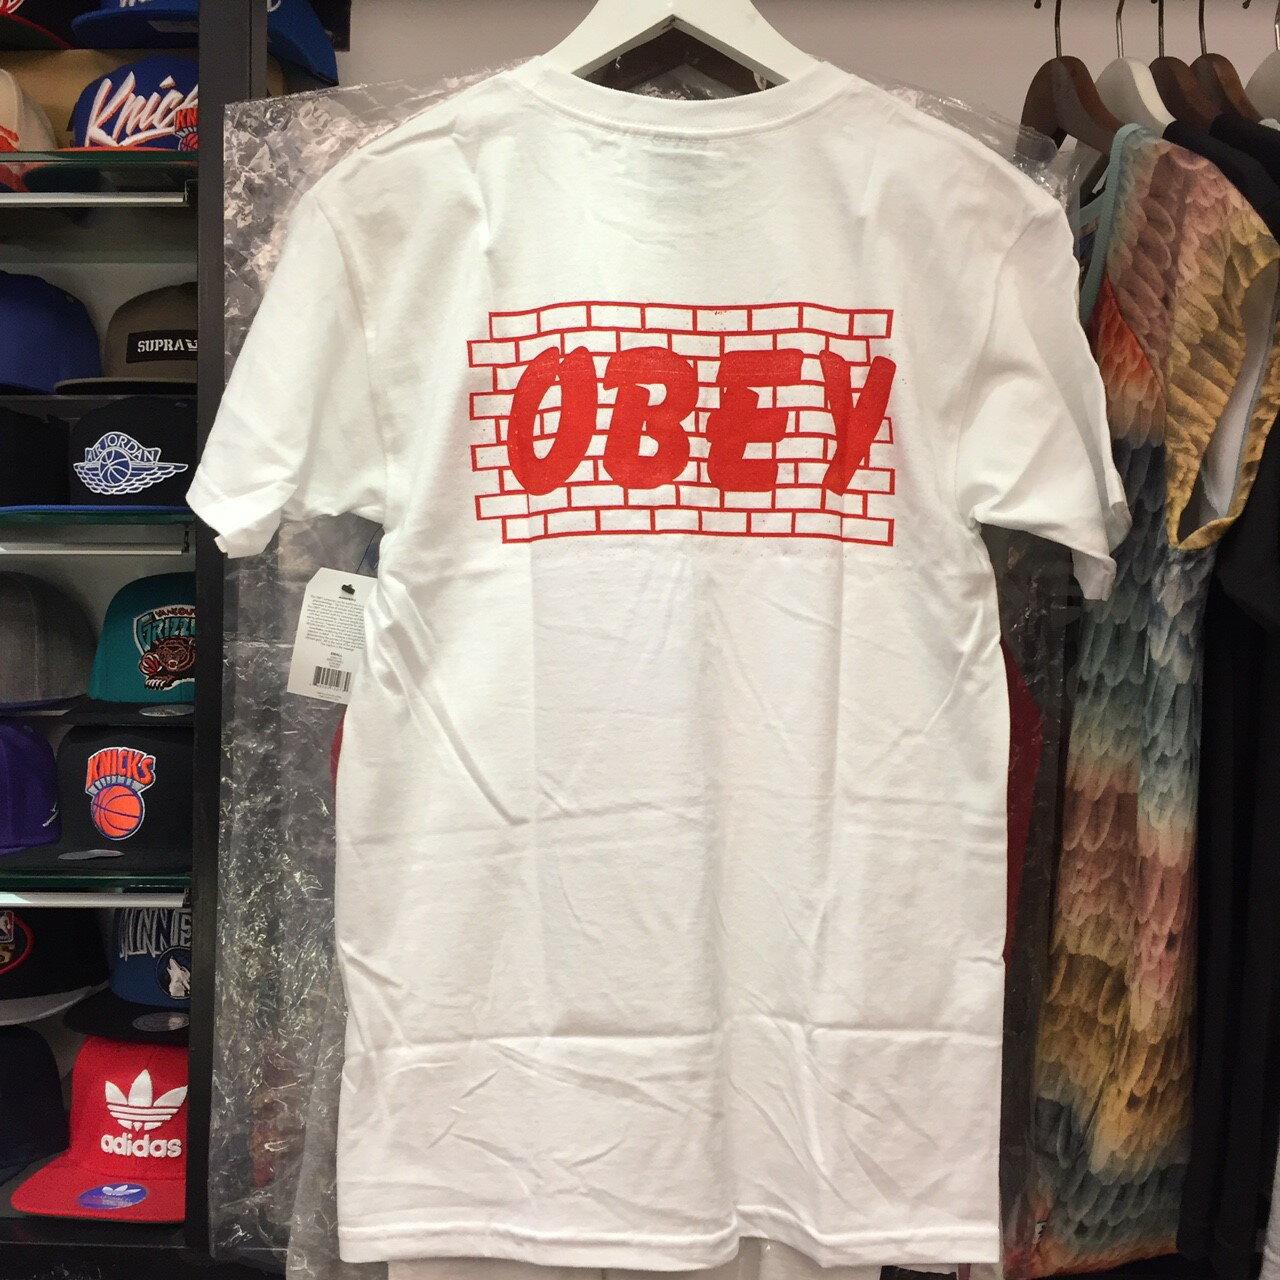 BEETLE PLUS 西門町經銷 全新 美國品牌 OBEY BRICK WALL TEE 磚牆 全白 黑字 白字 LOGO 短 TEE 163081179WHT OB-420 2